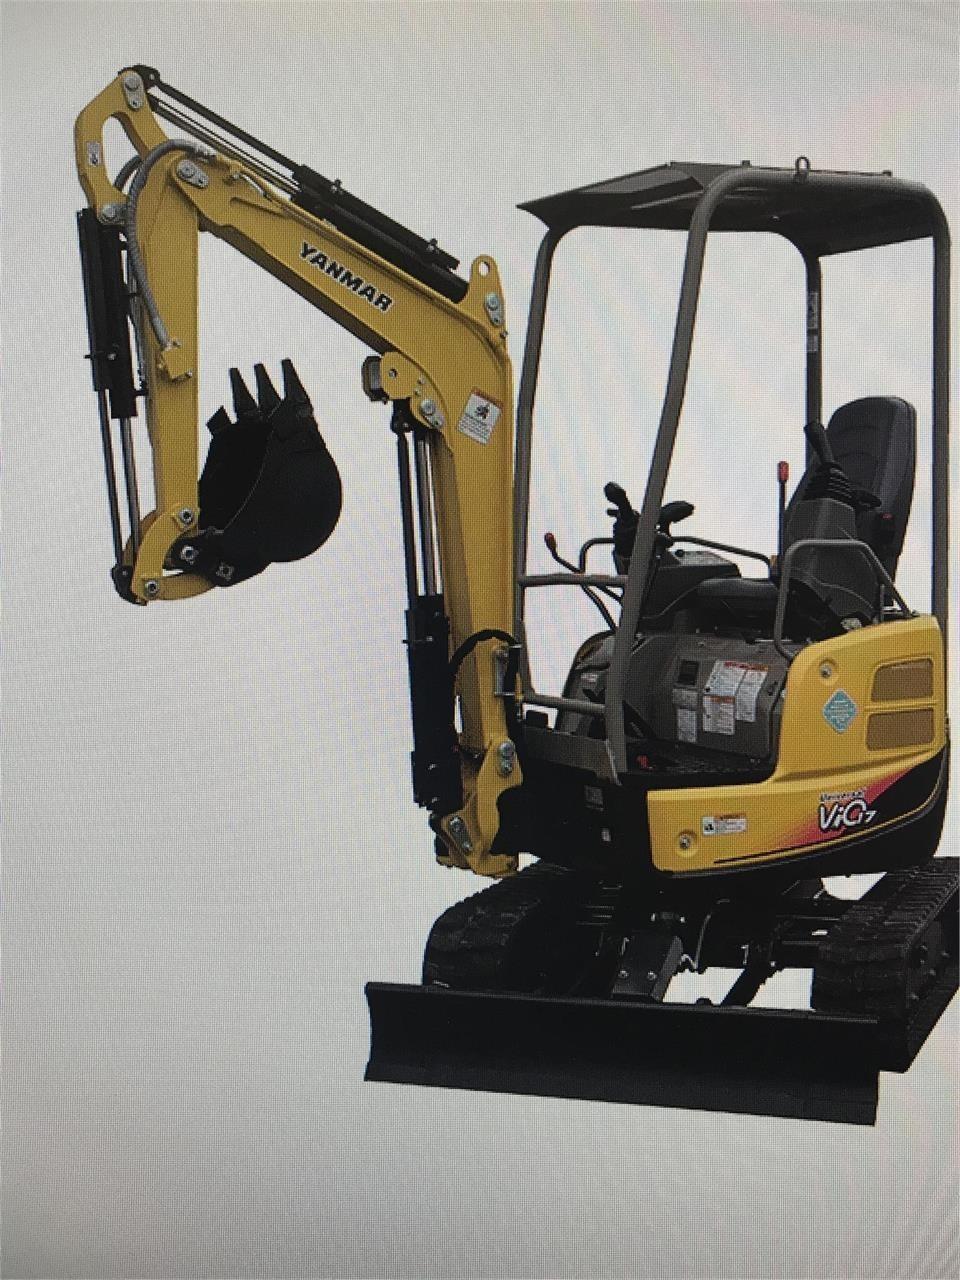 2021 Yanmar VIO17 Excavators and Mini Excavator